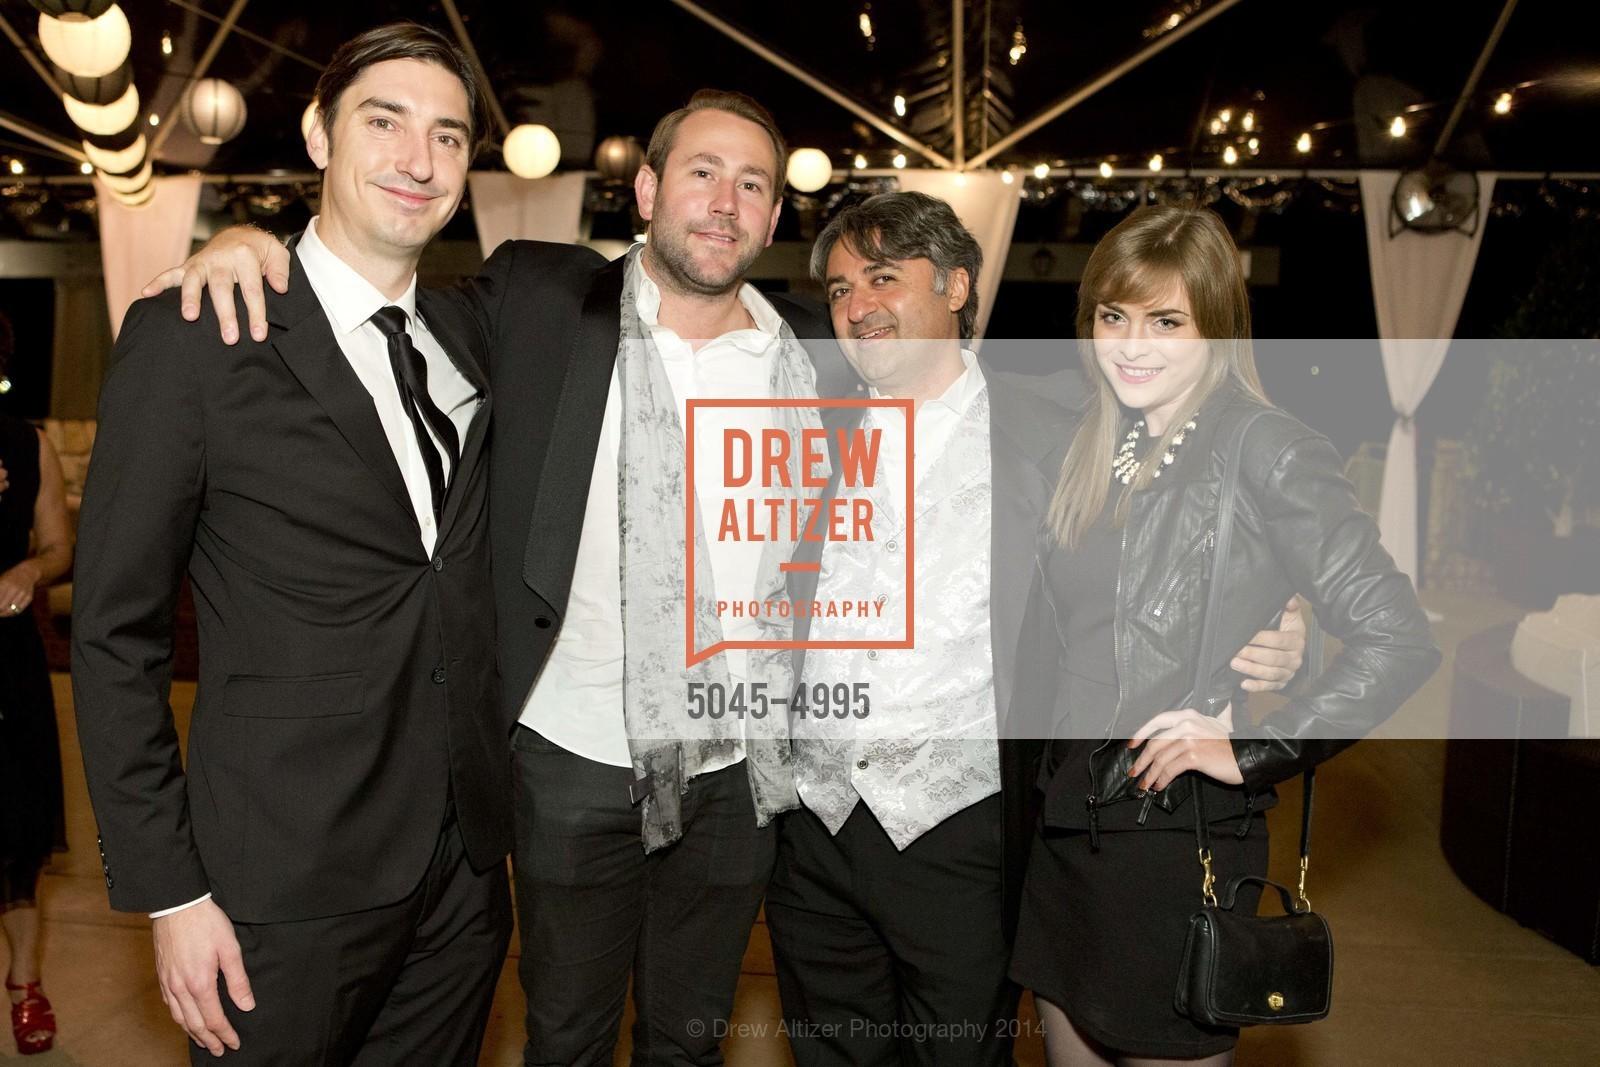 Doug Dalton, Clint Miller, Hooman Khalili, Isabelle, Photo #5045-4995